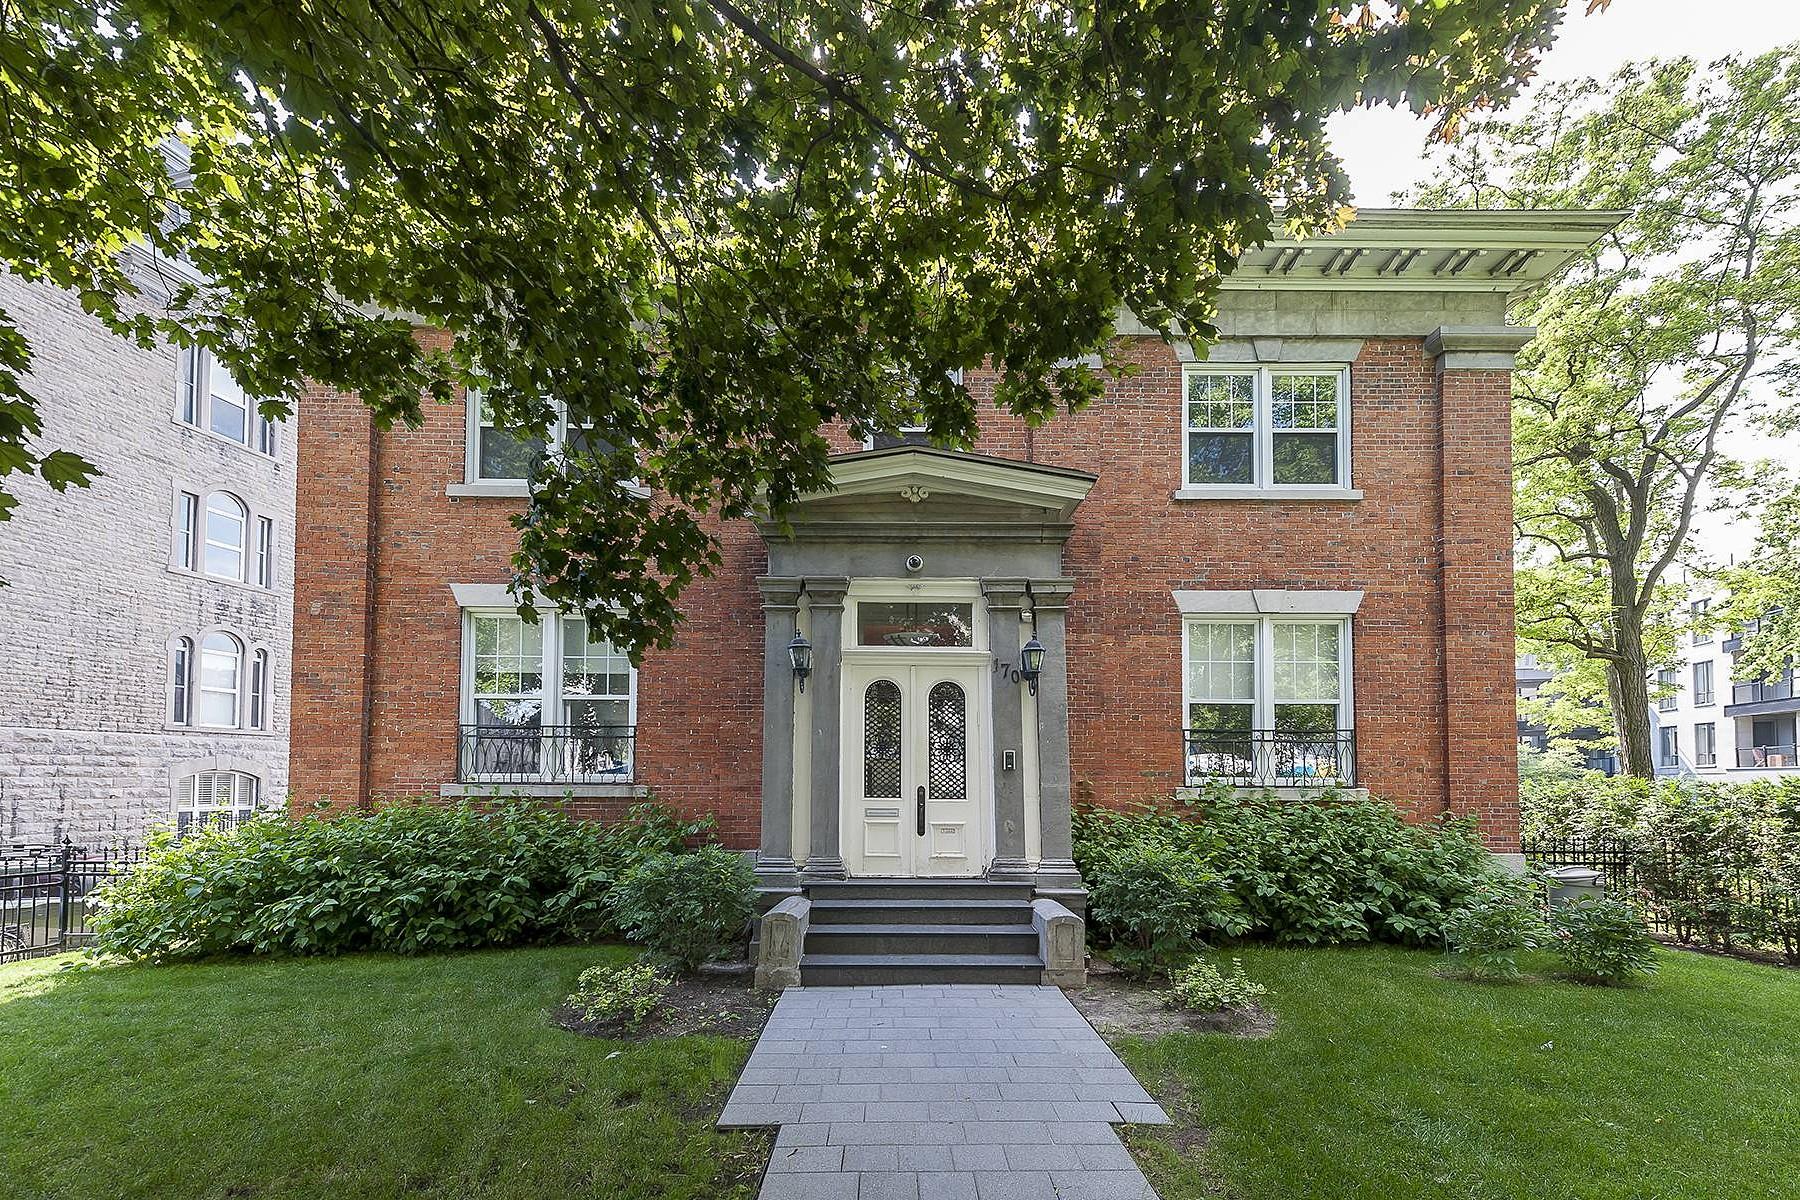 Tek Ailelik Ev için Satış at Ville-Marie (Montréal), Montréal 170 Rue Sherbrooke E. Montreal, Quebec H2X1C8 Kanada